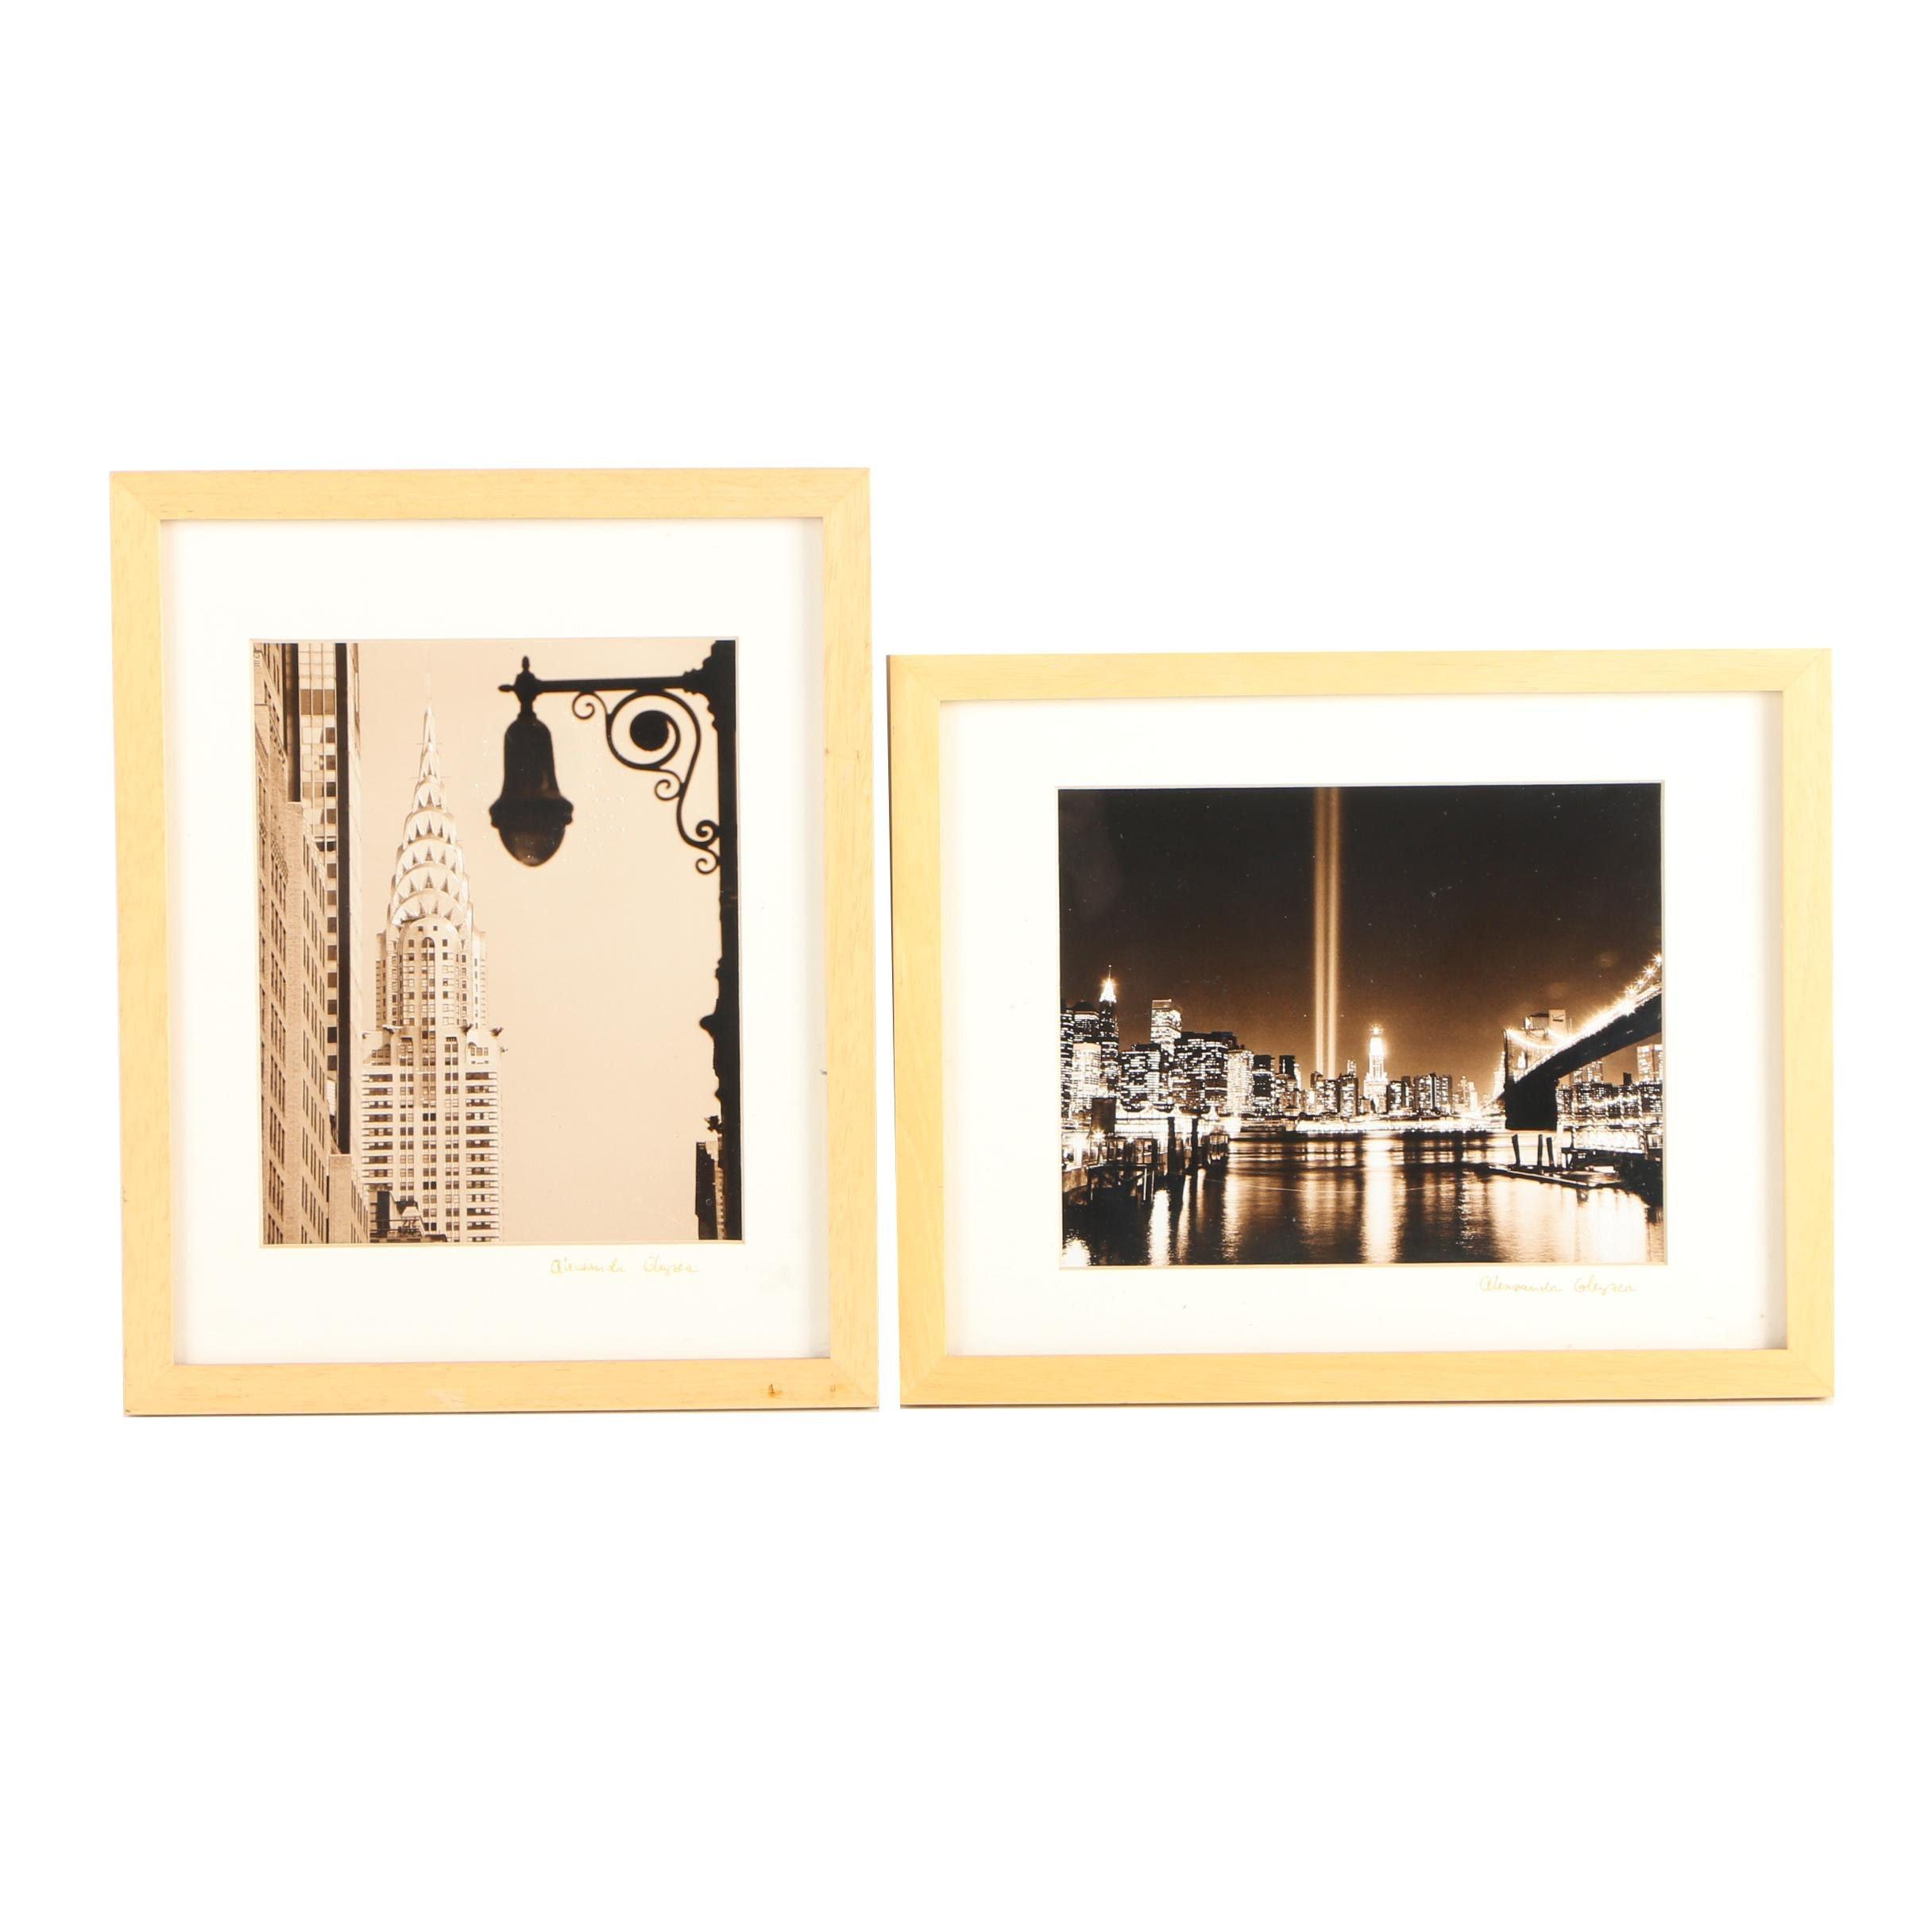 Two Alexandr Gleyzer Digital Photographs of New York